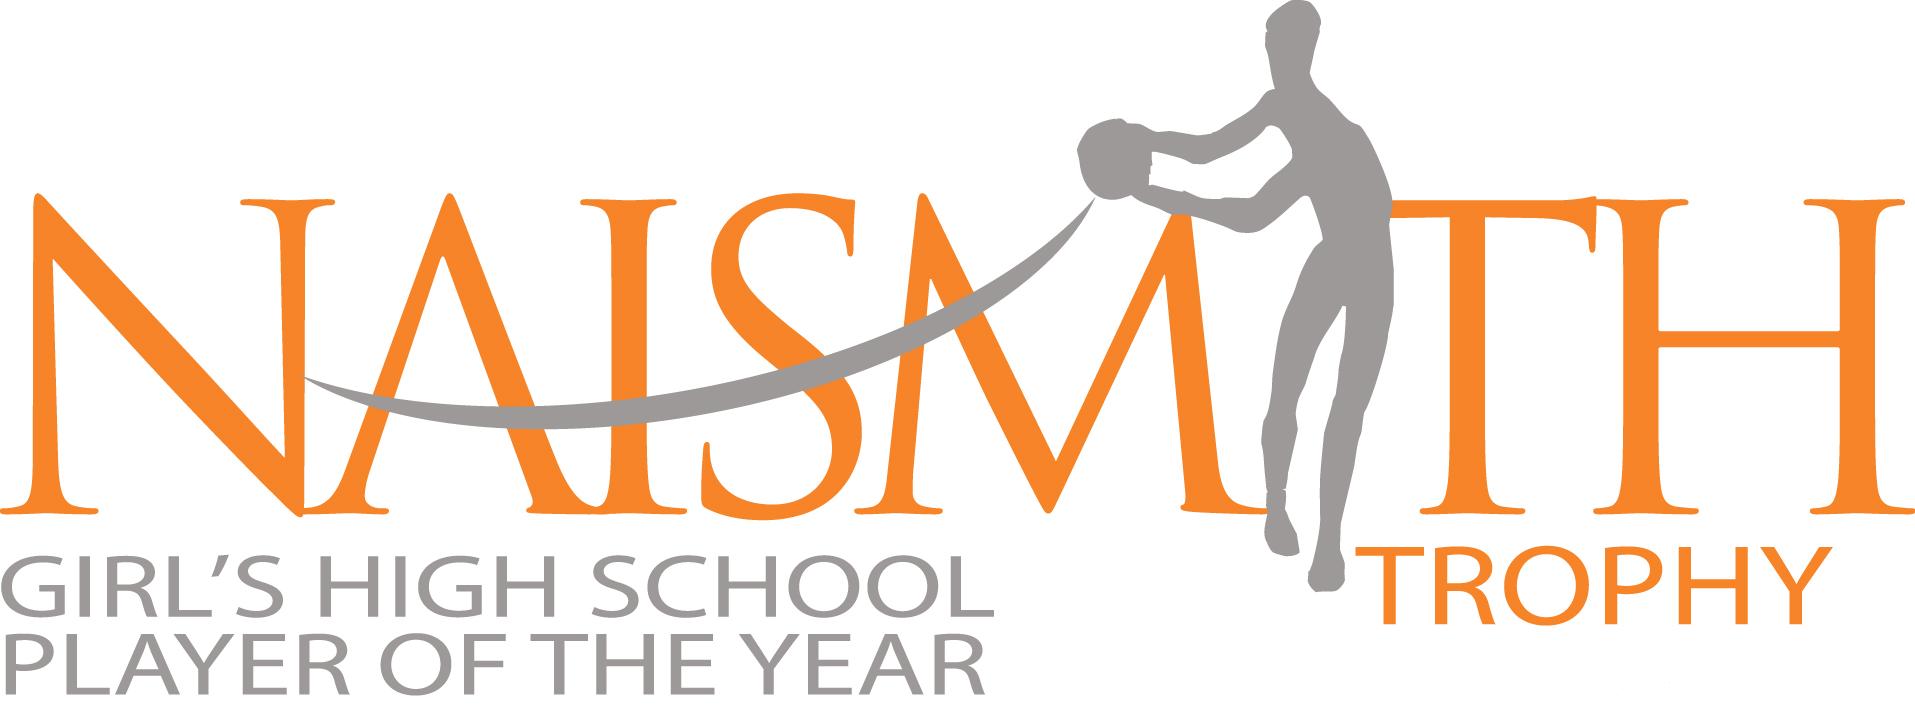 2017 Naismith Trophy Girls High School Player of the Year Preseason Watch List